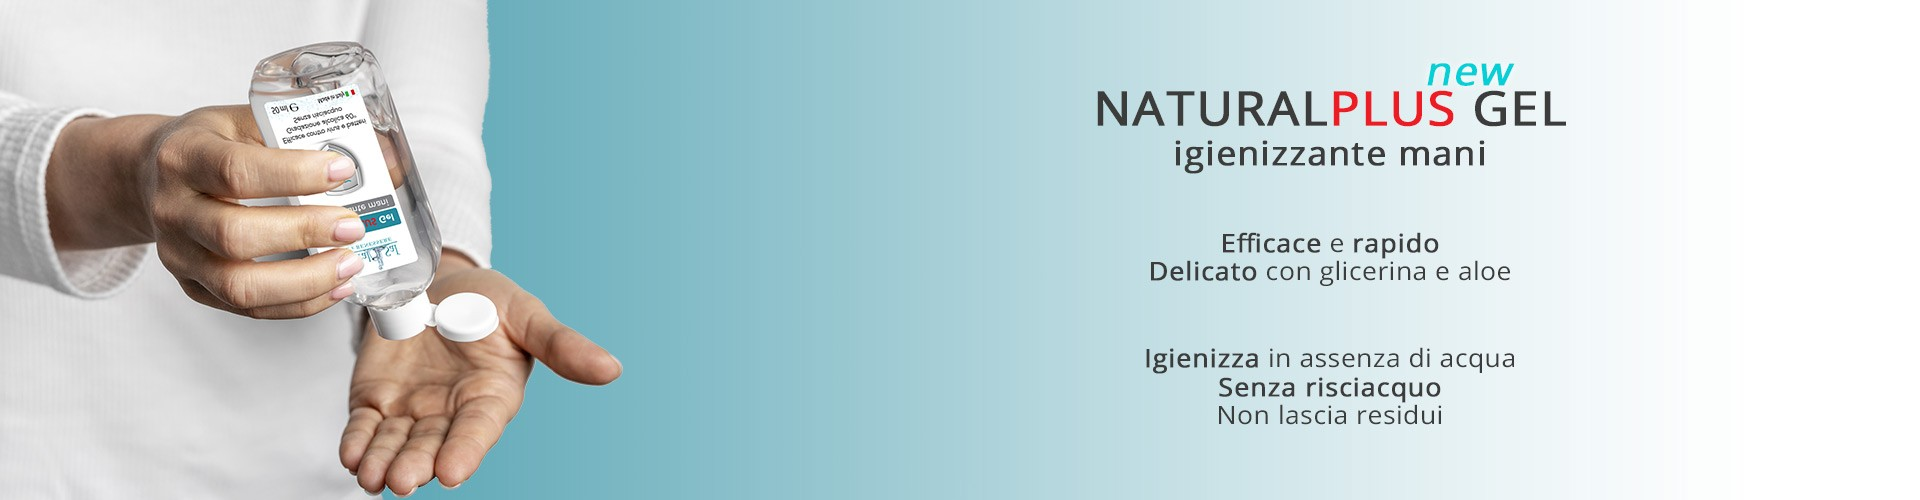 NaturalPlus Gel igienizzante mani DEFINITIVO